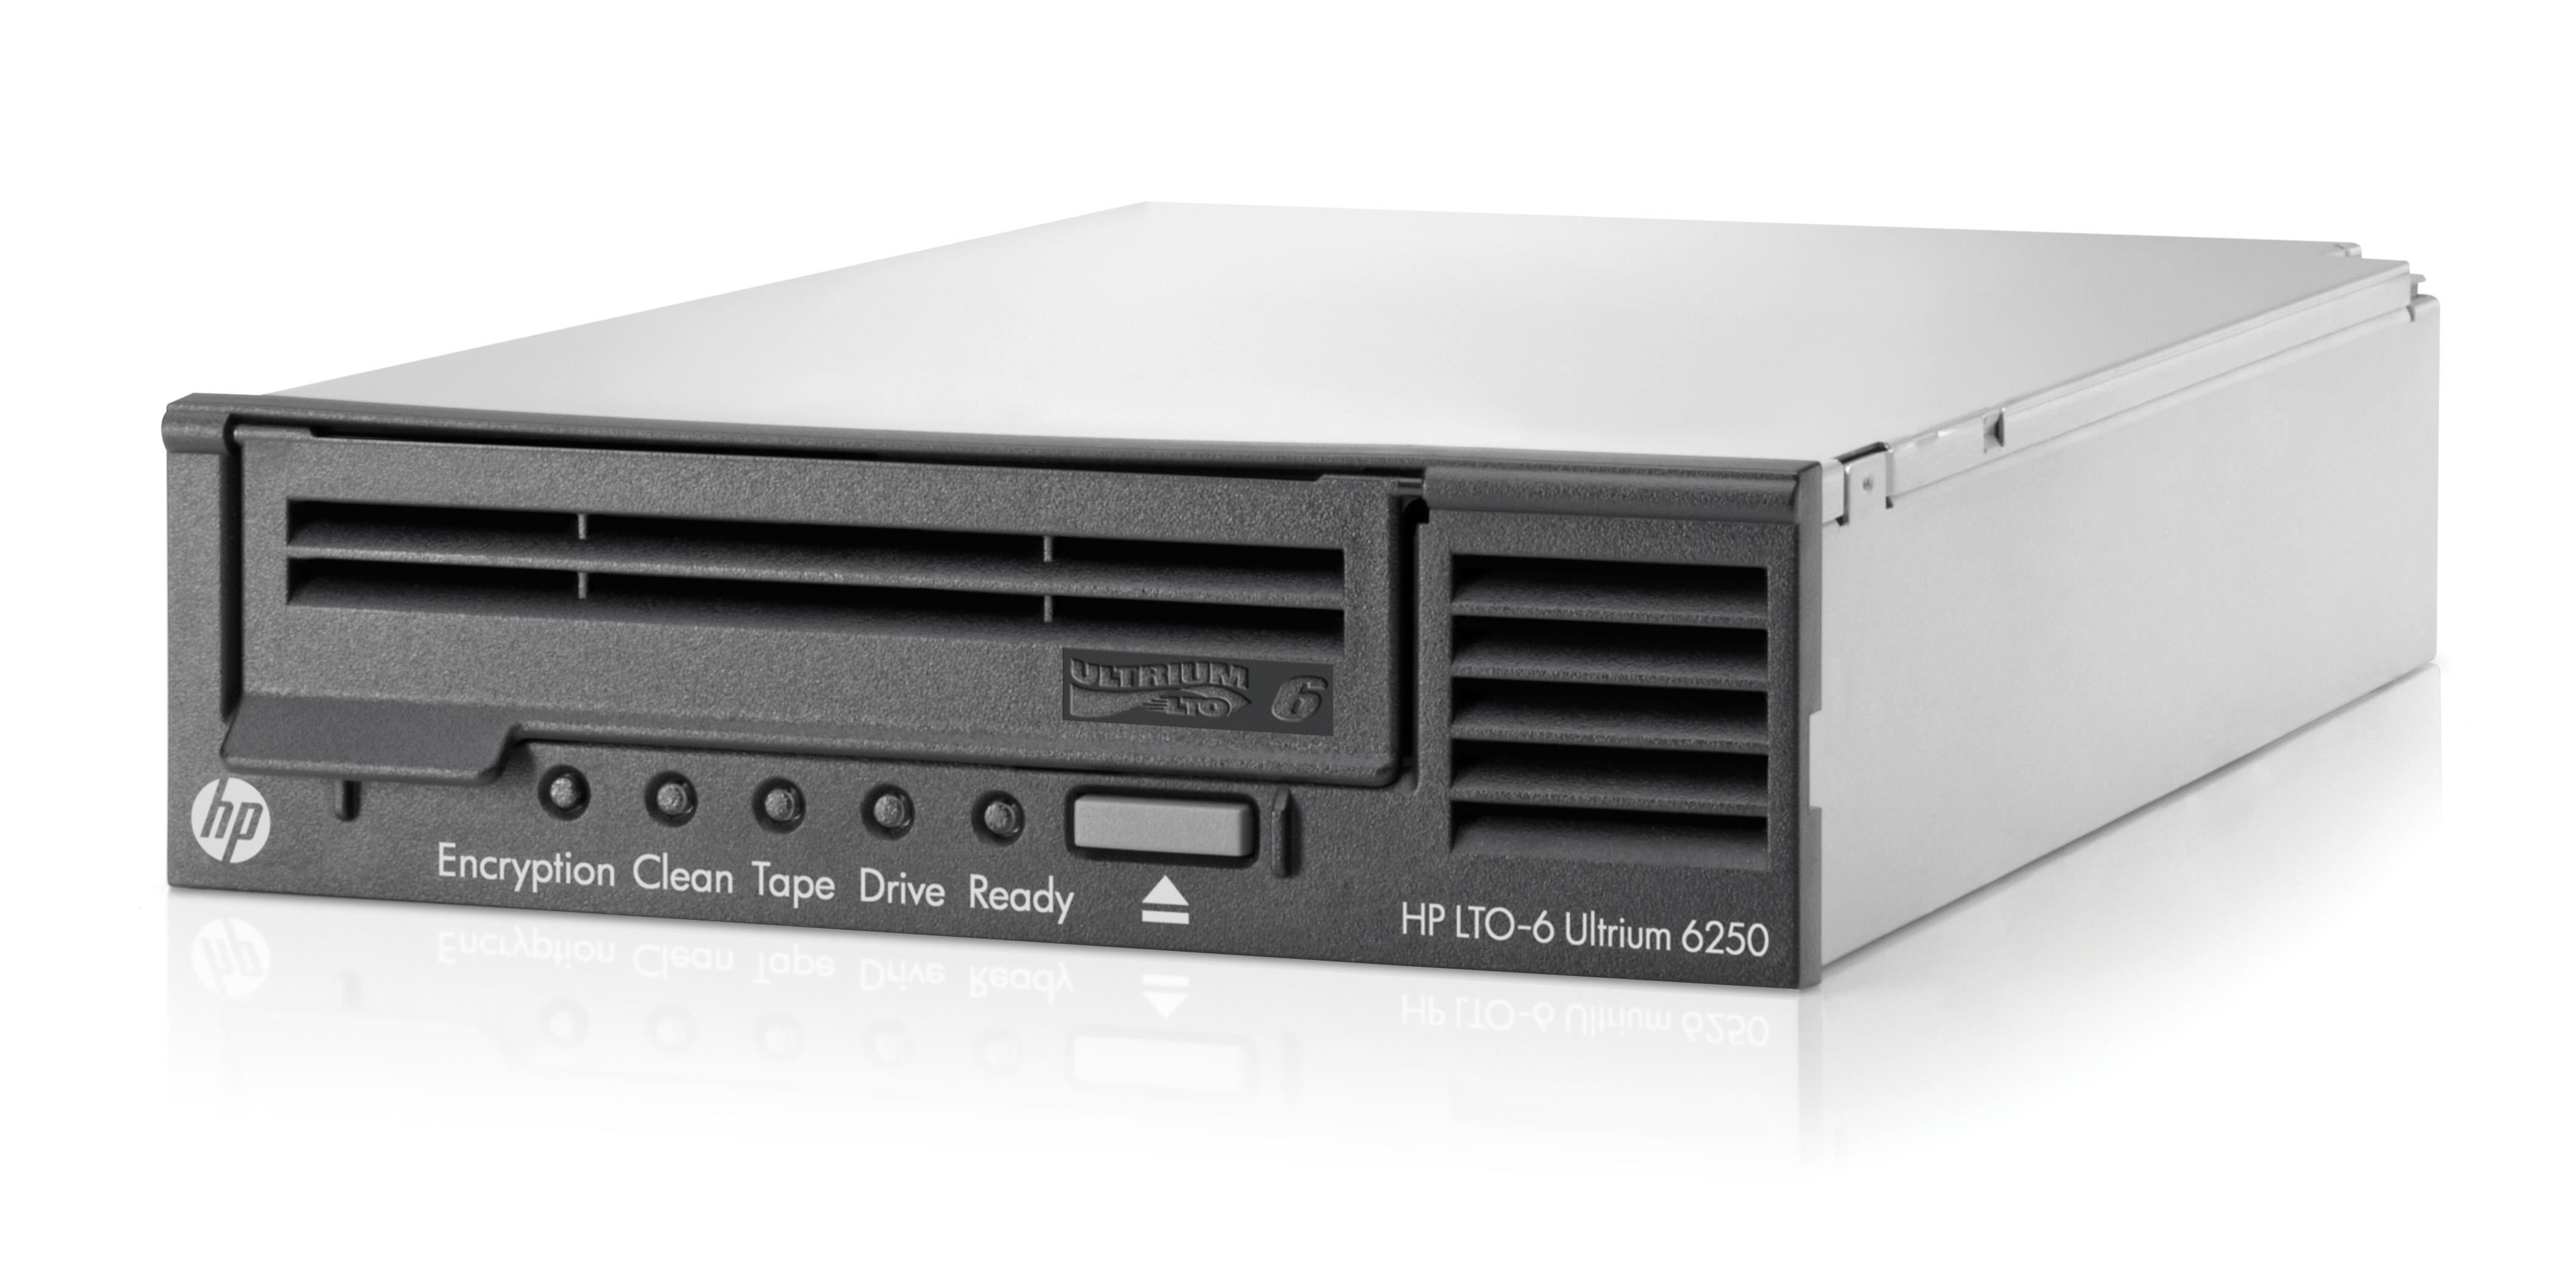 HP StoreEver LTO-6 Ultrium 6250 Tape Drive (Internal)